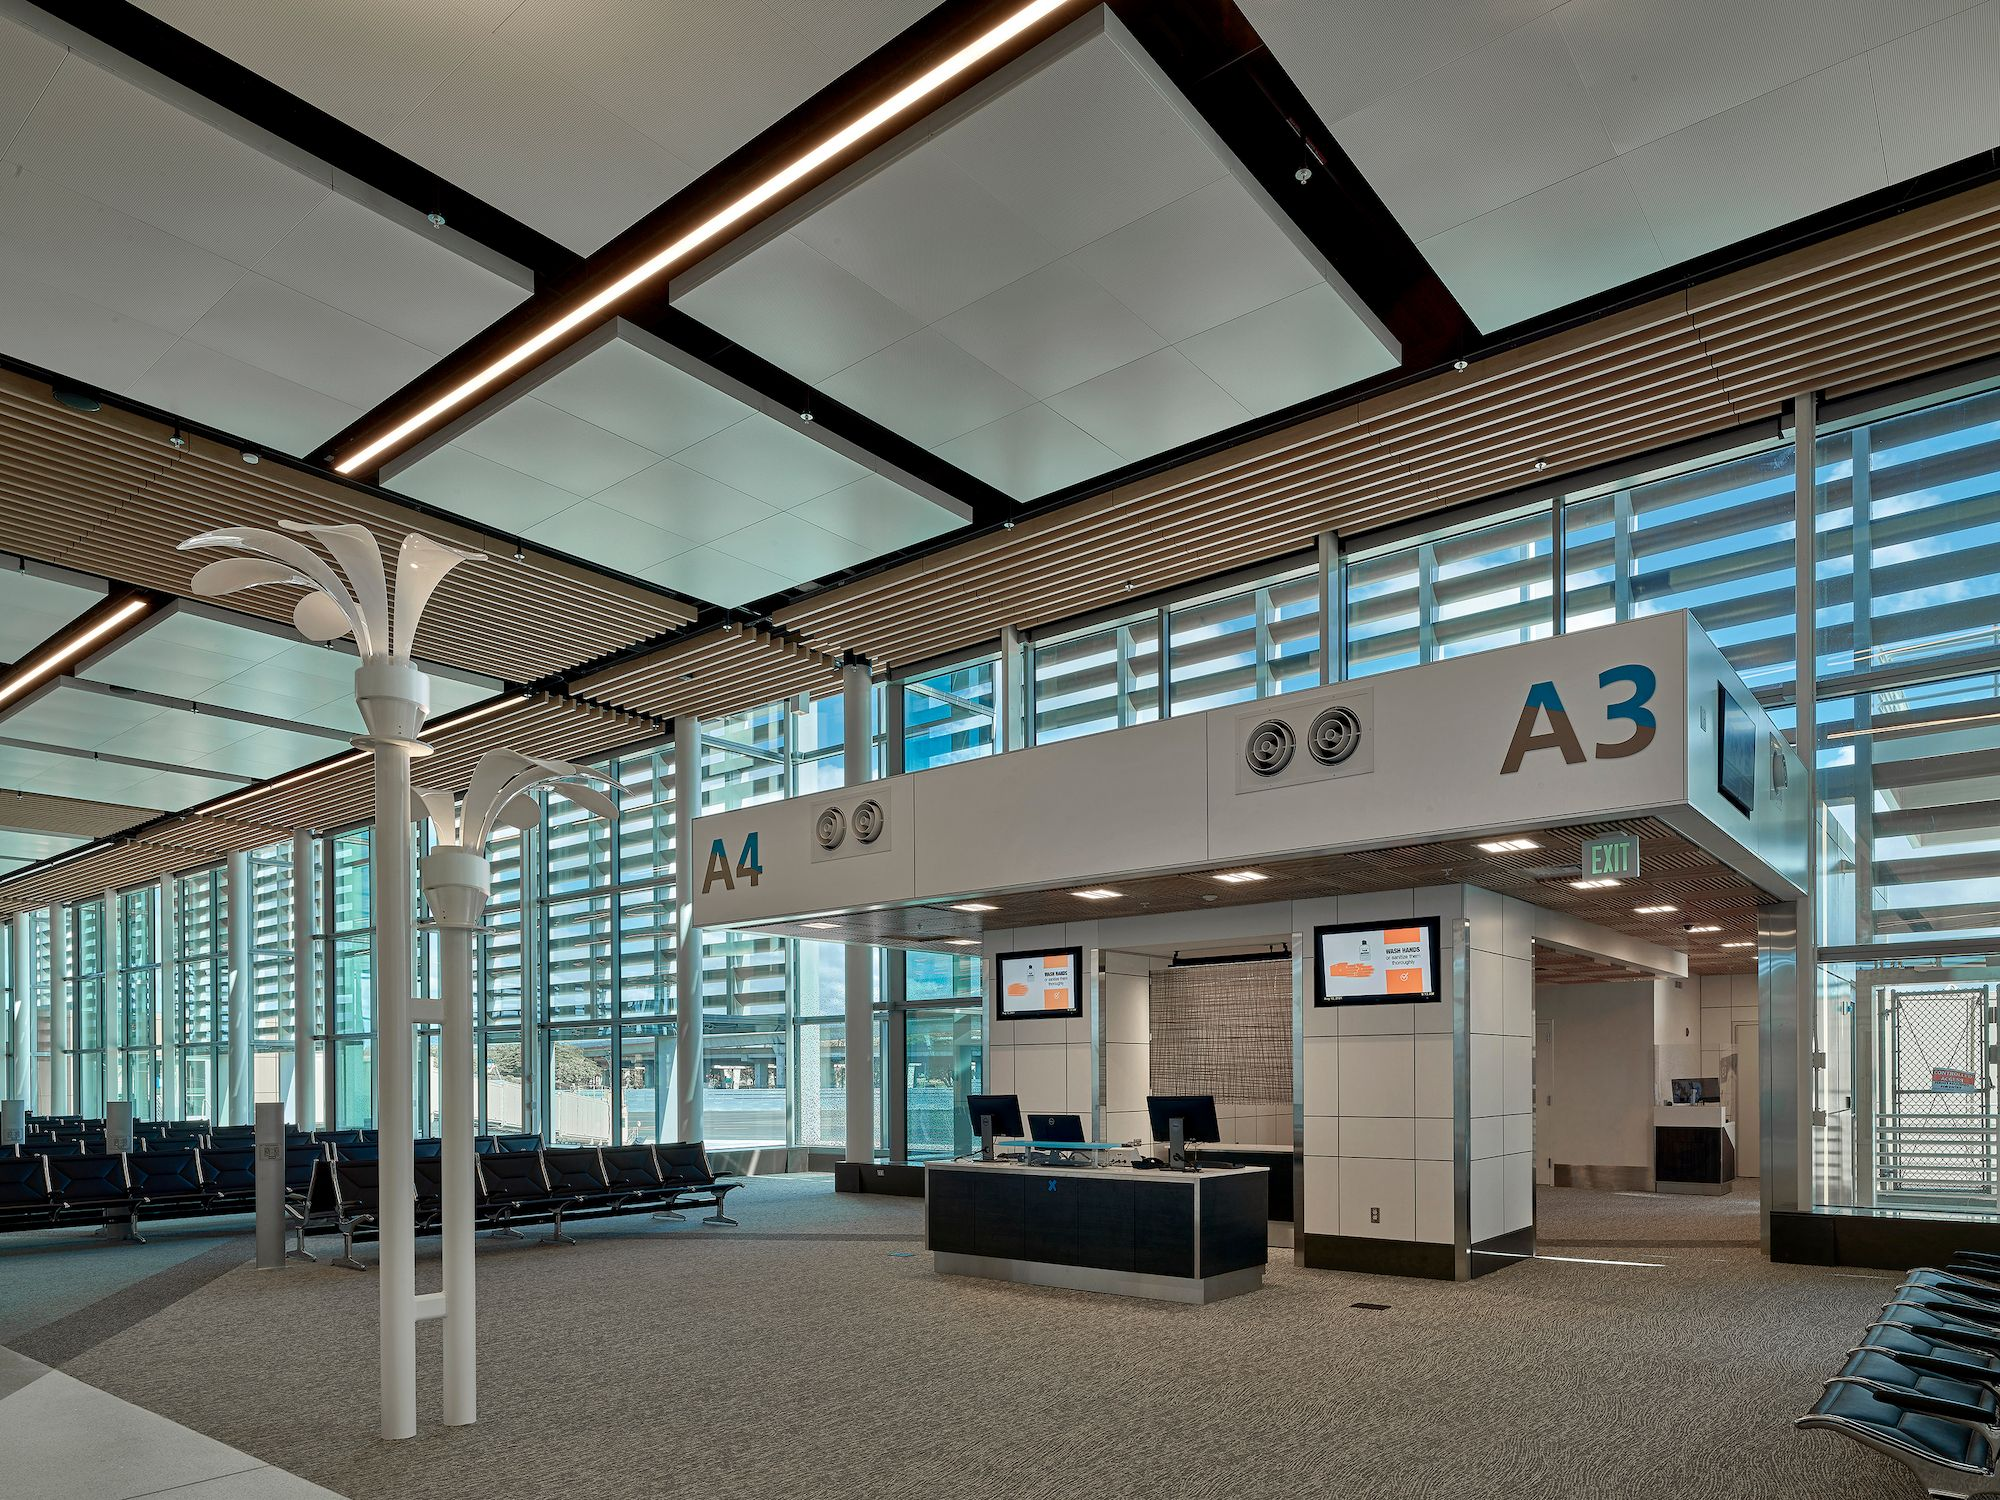 New Honolulu Airport terminal